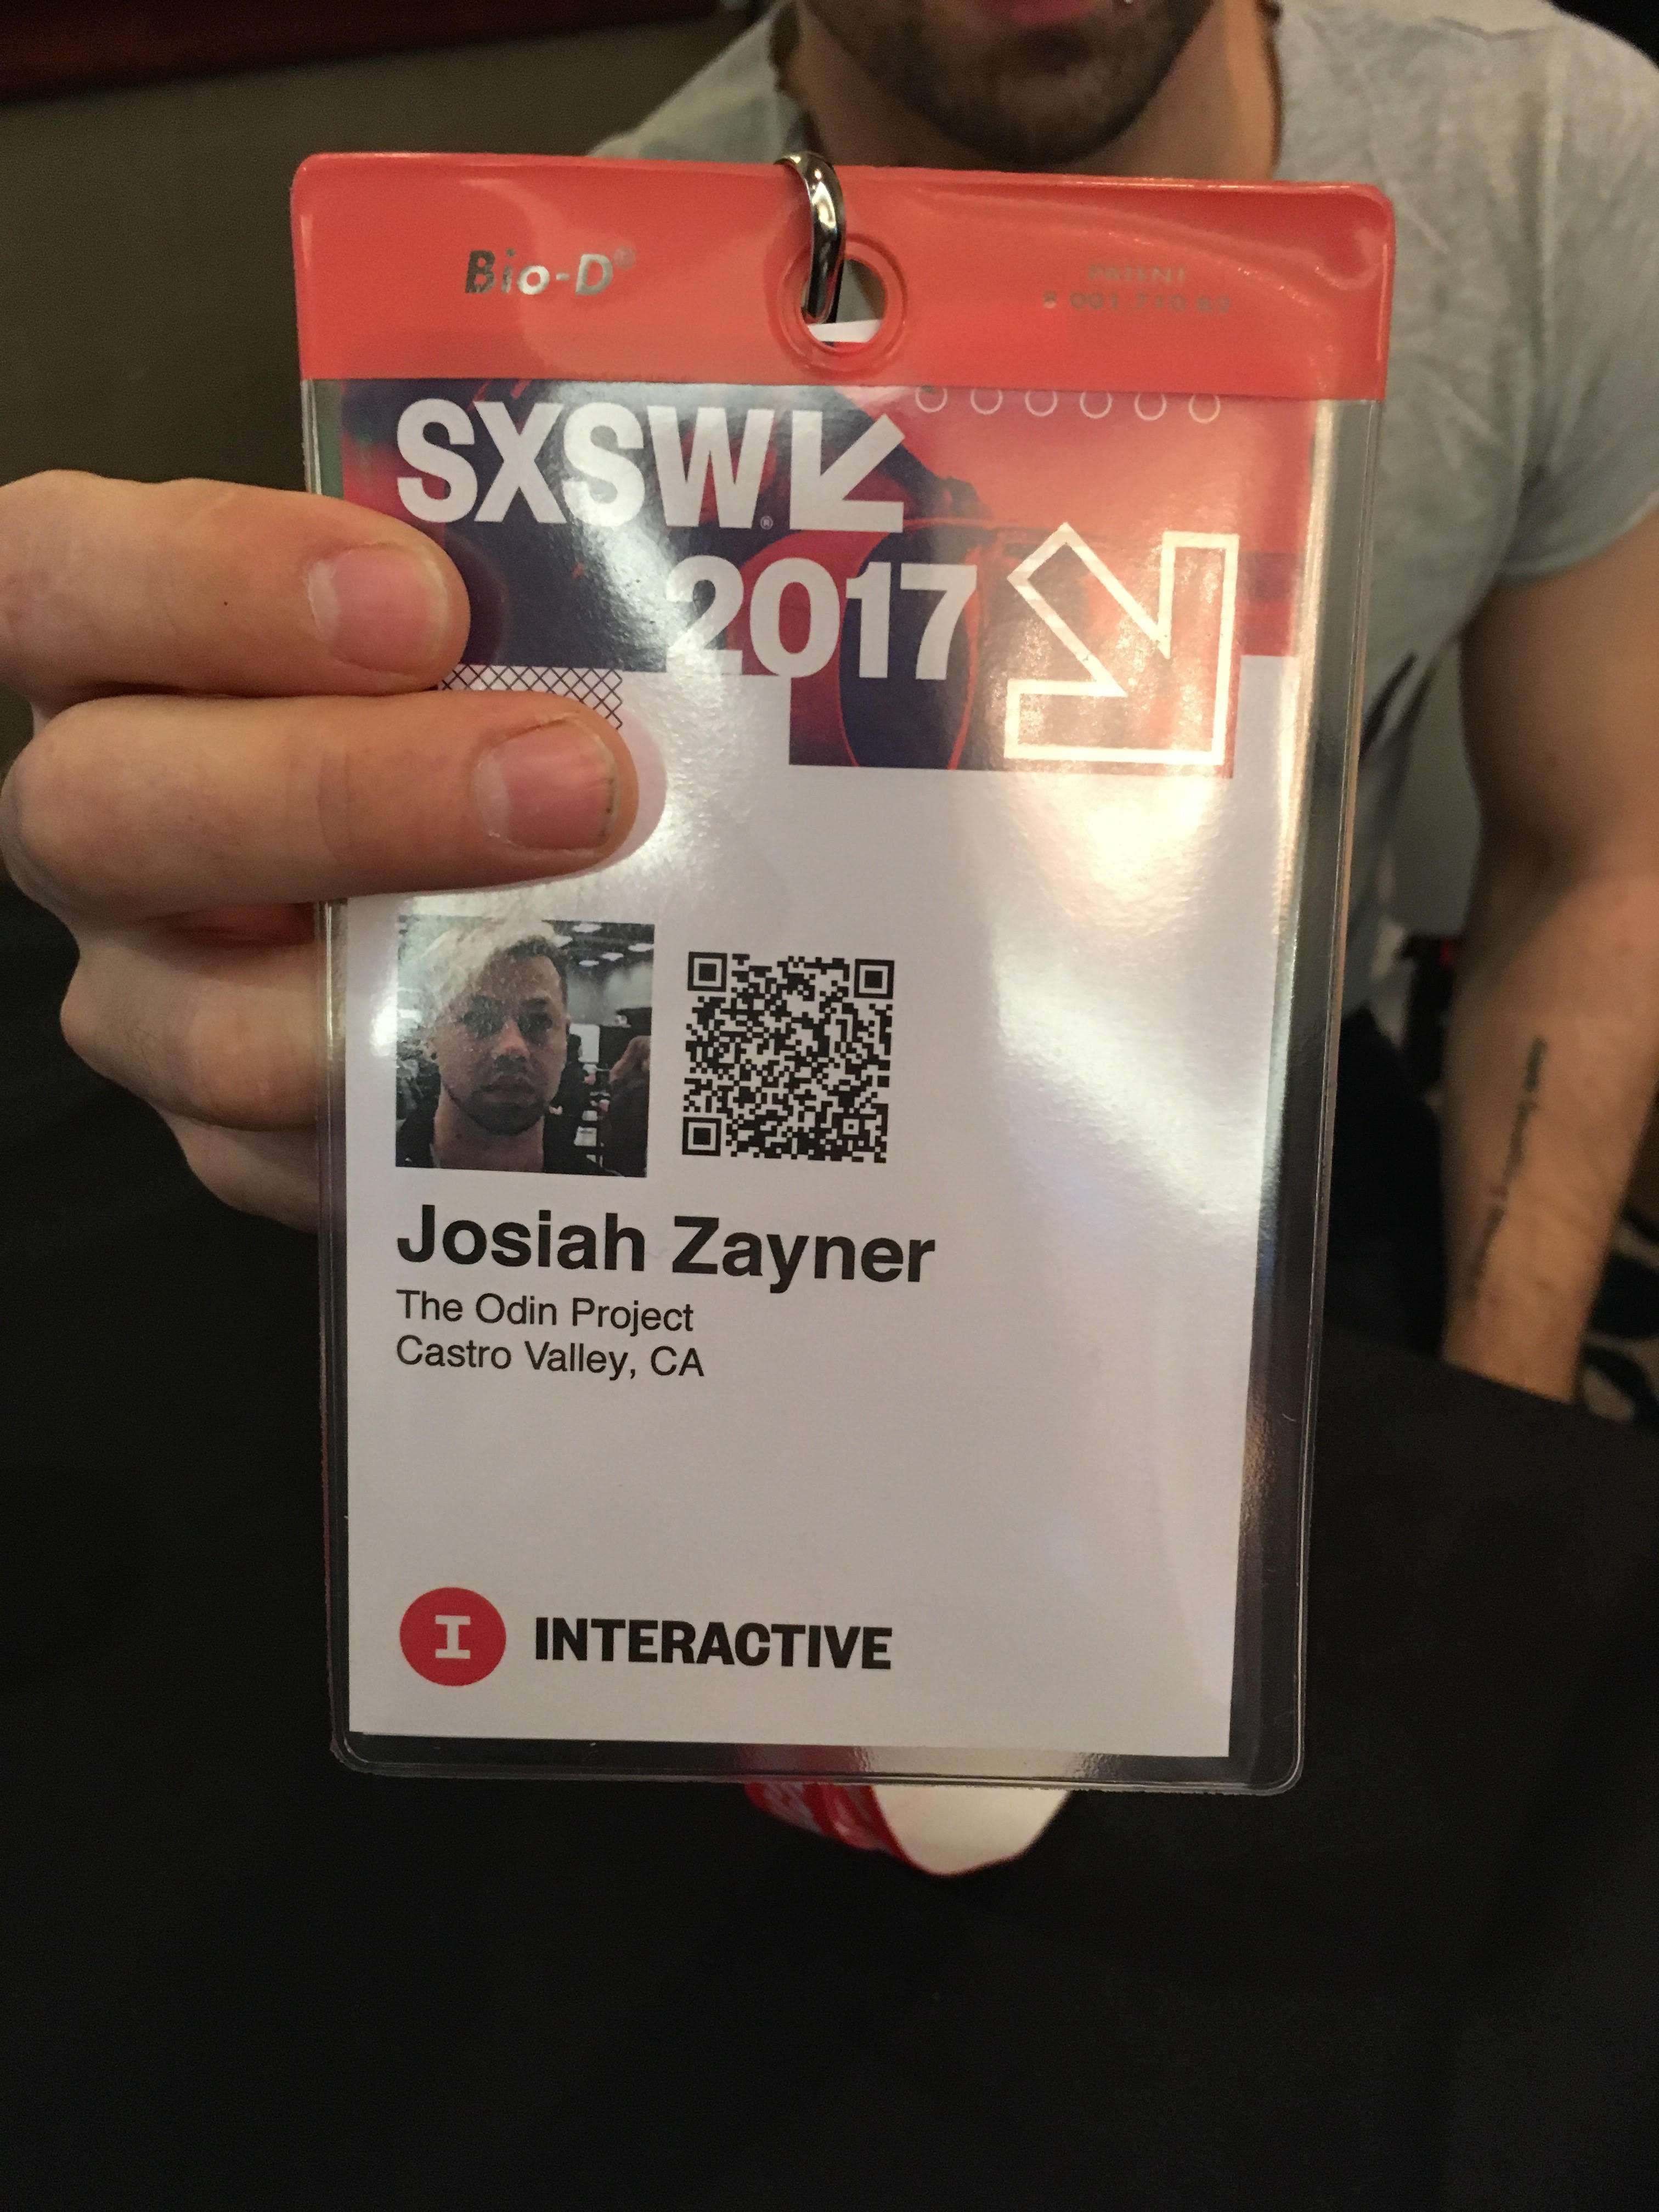 Josiah Zayner